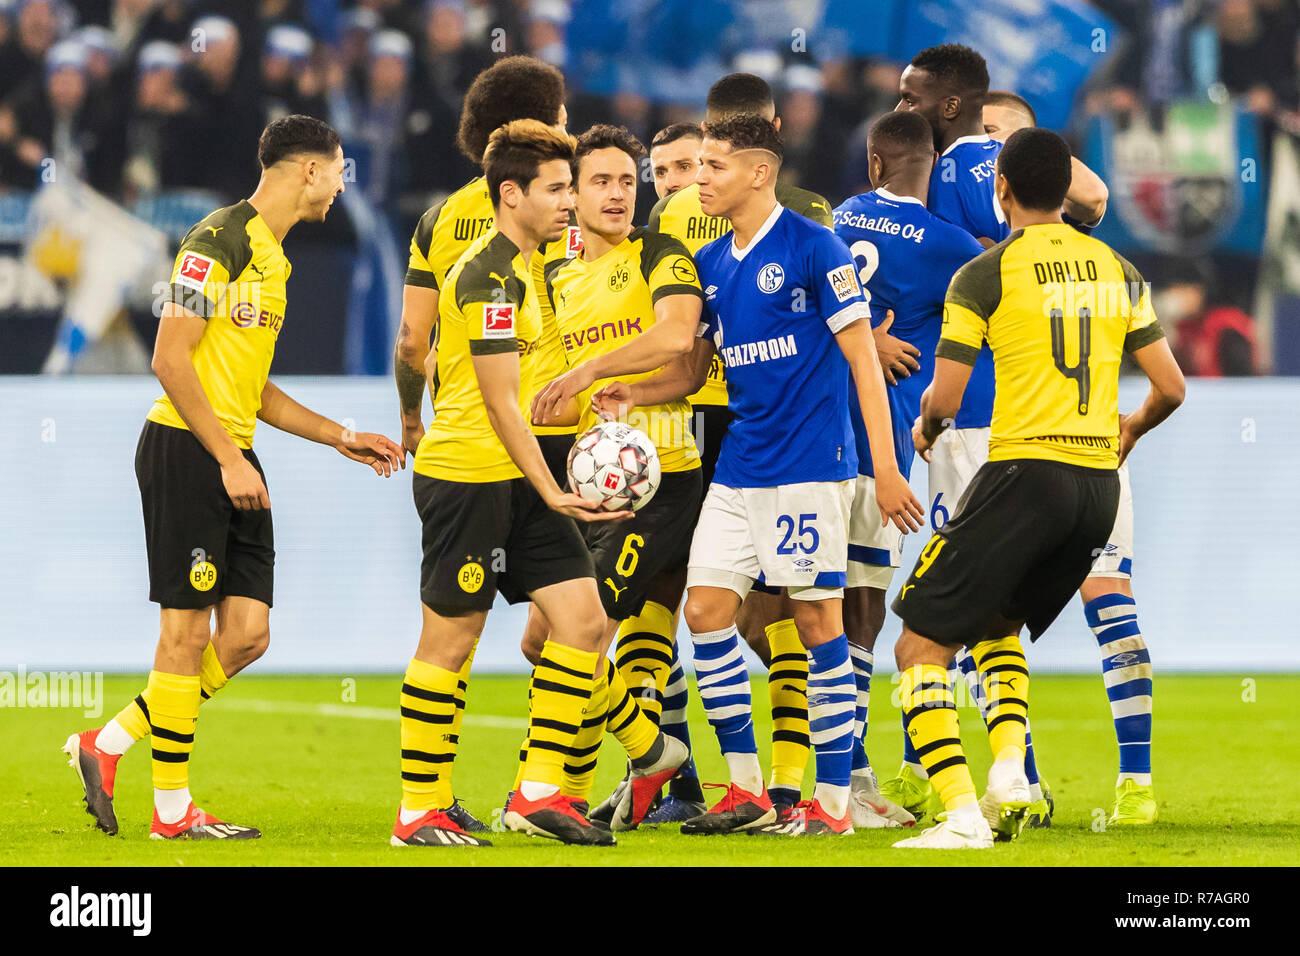 Gelsenkirchen, Germany 08 december 2018 Soccer Bundesliga: Schalke 04 v  Borussia Dortmund l+r fighting in Ruhrpot Derby Stock Photo - Alamy